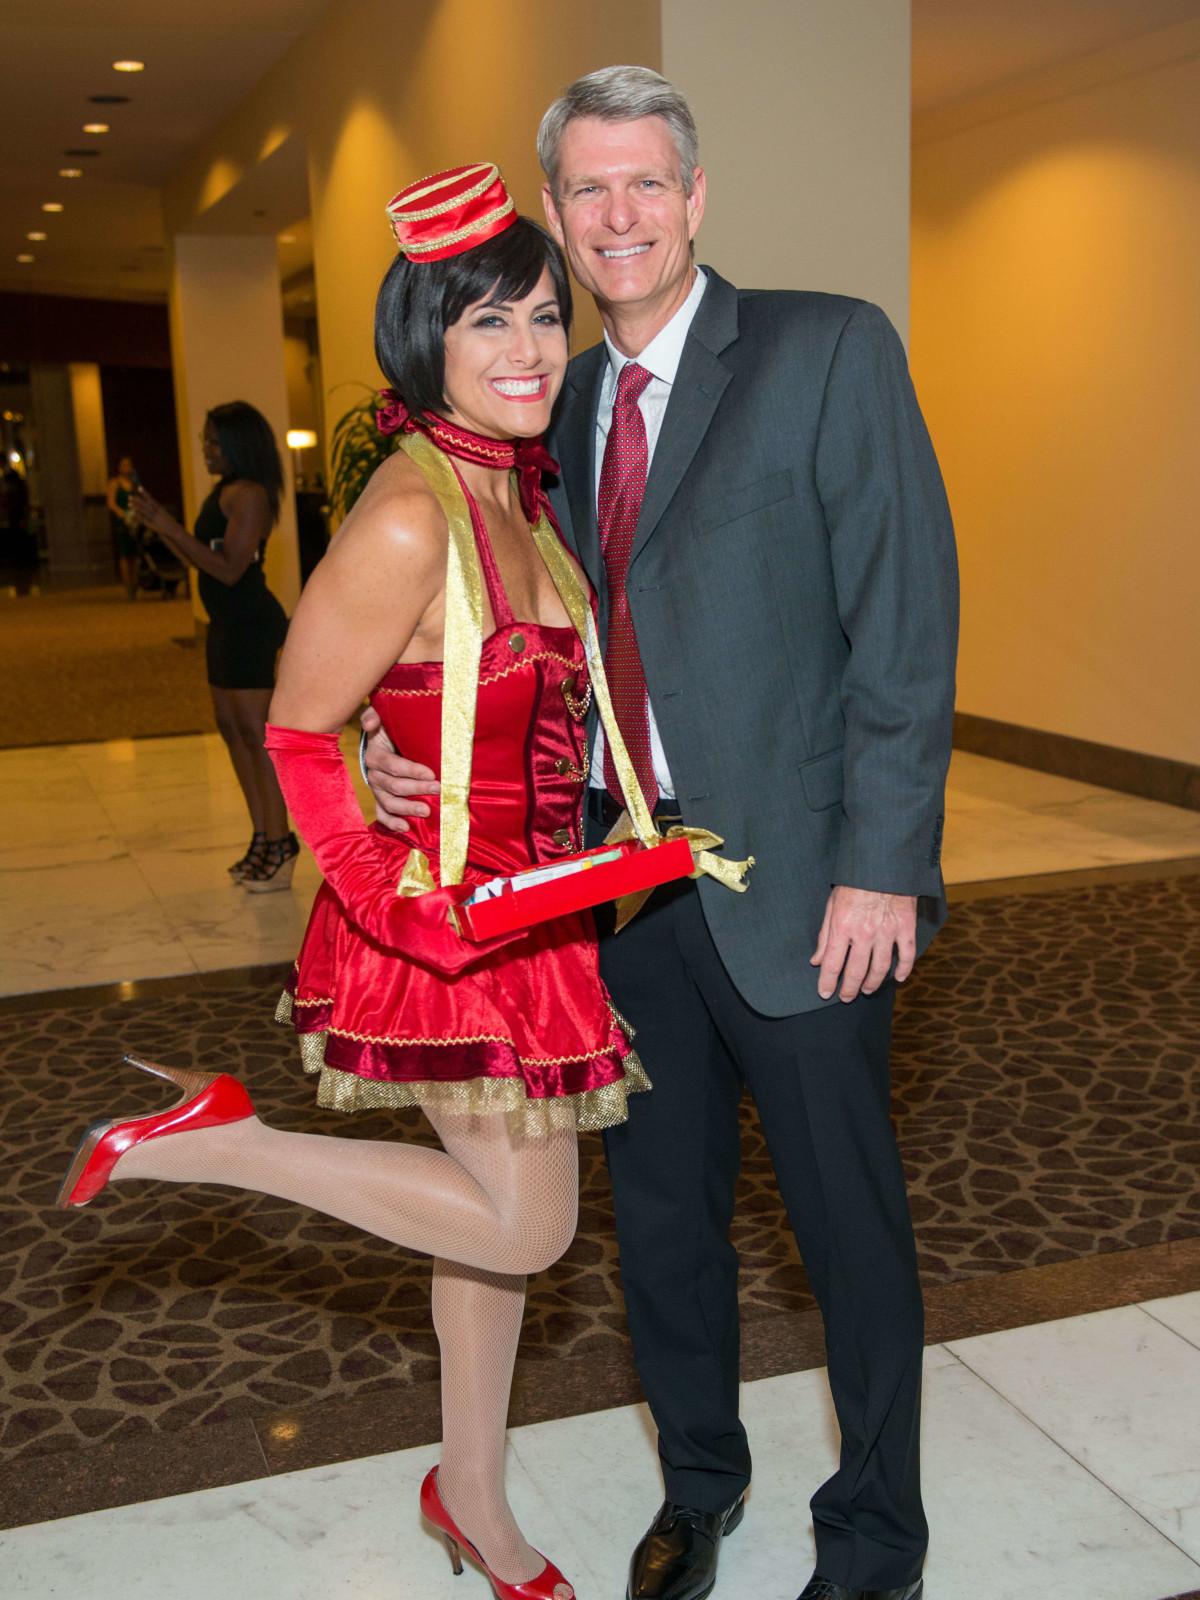 Adele Hartland, Jason Herbert at Mission of Yahweh gala